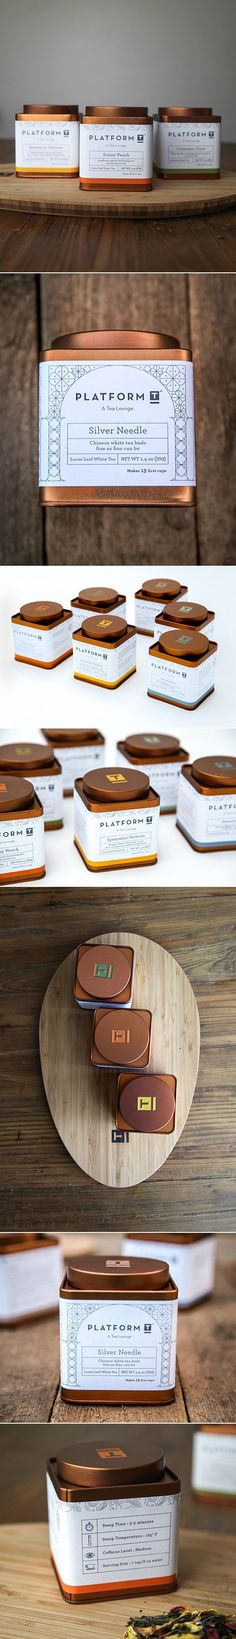 Lovely Package - Platform T